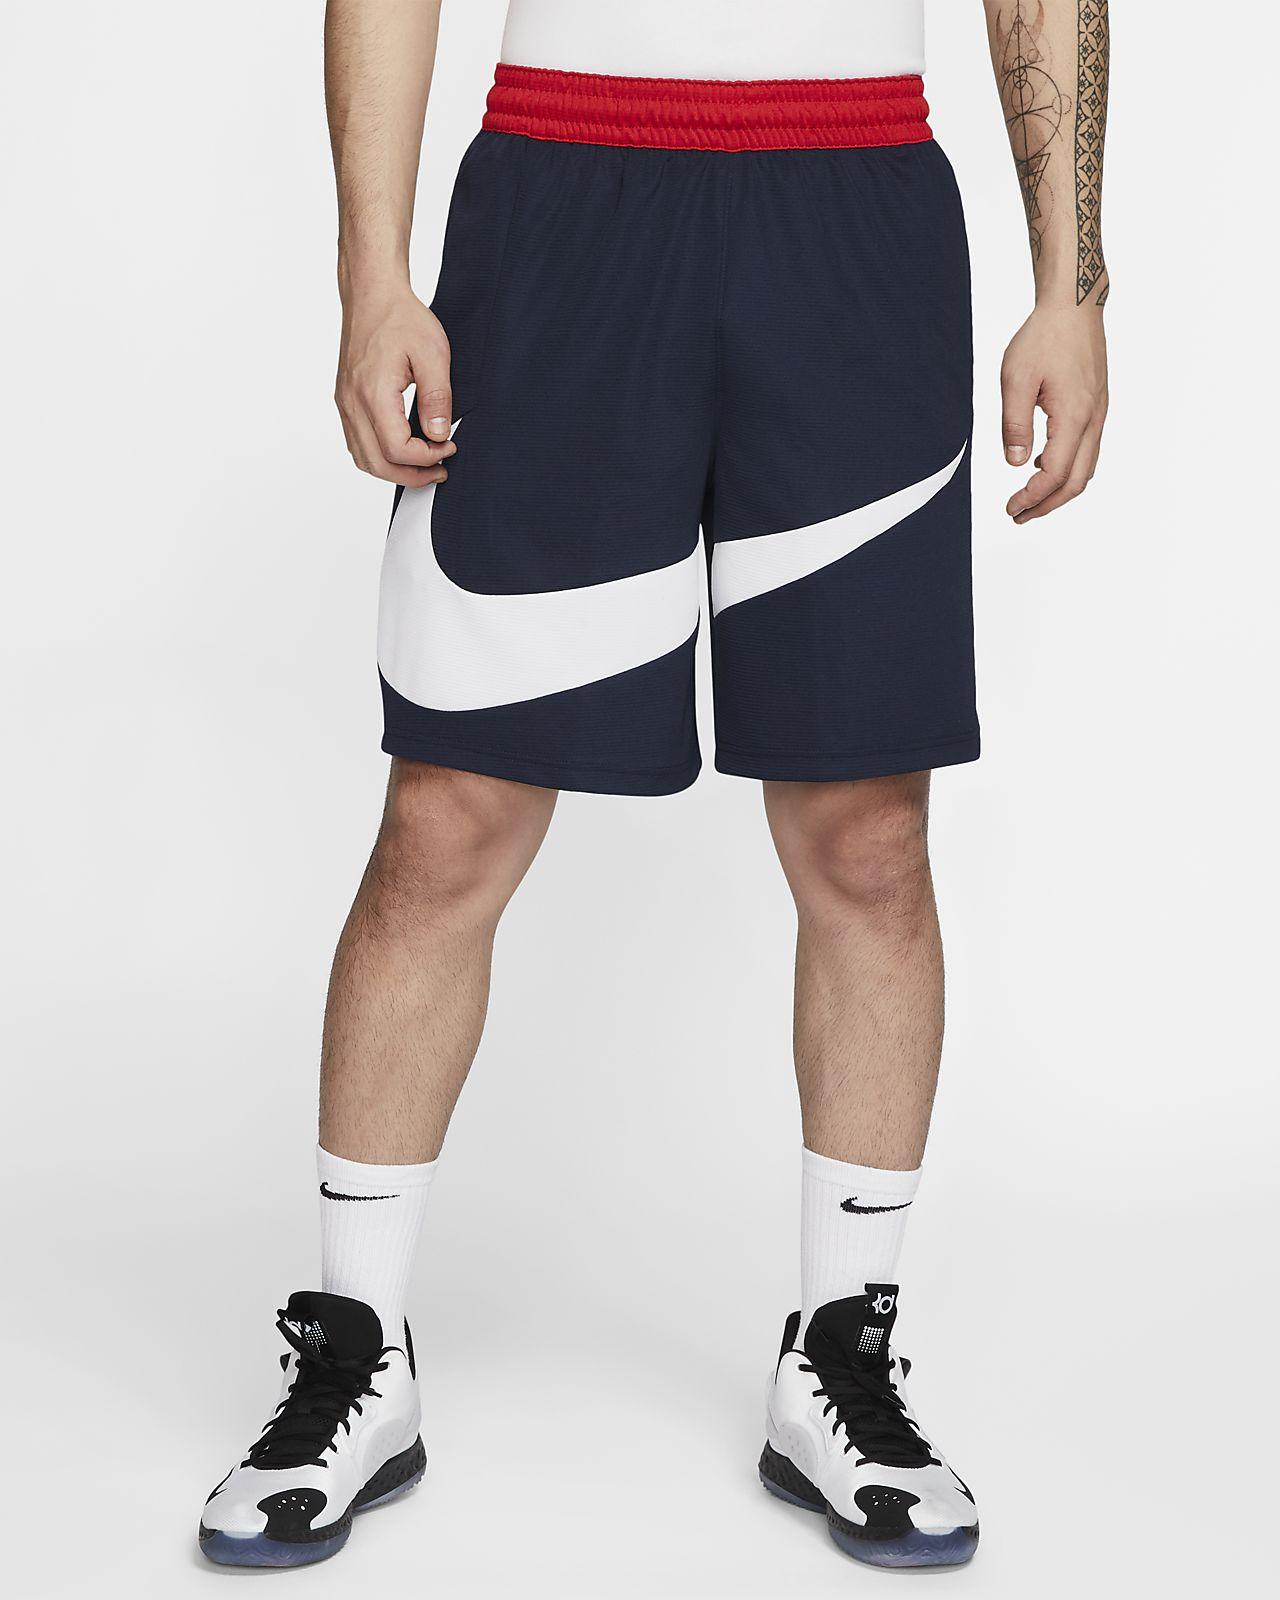 Shorts da basket Nike Dri-FIT - Uomo